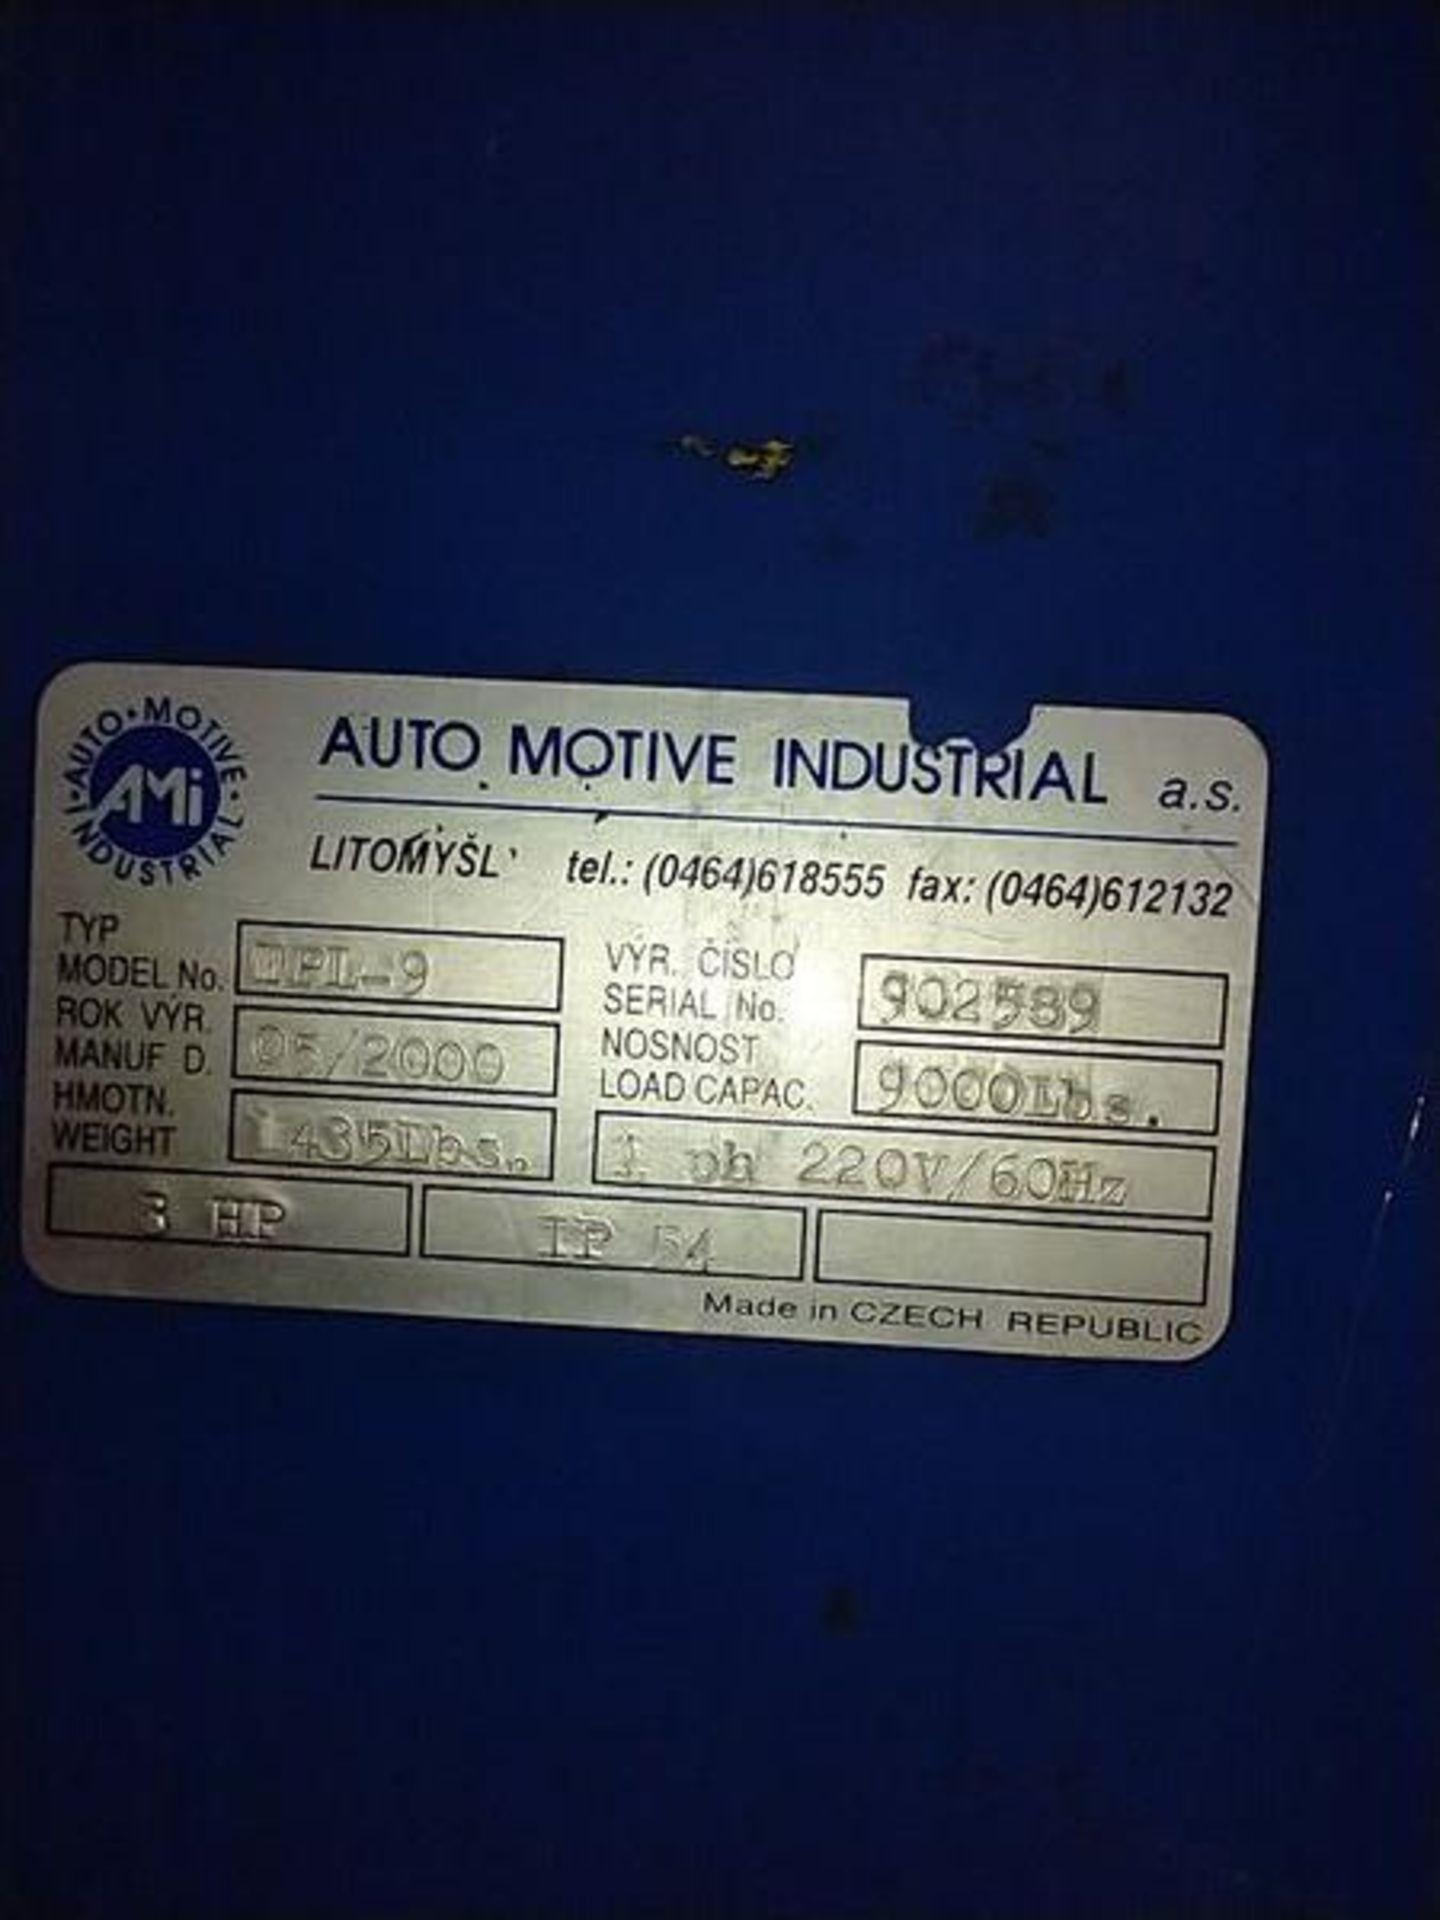 AUTO MOTIVE 2 POINT LIFT - MODEL TPL-9 , 3HP , 9000LB CAP - Image 6 of 7